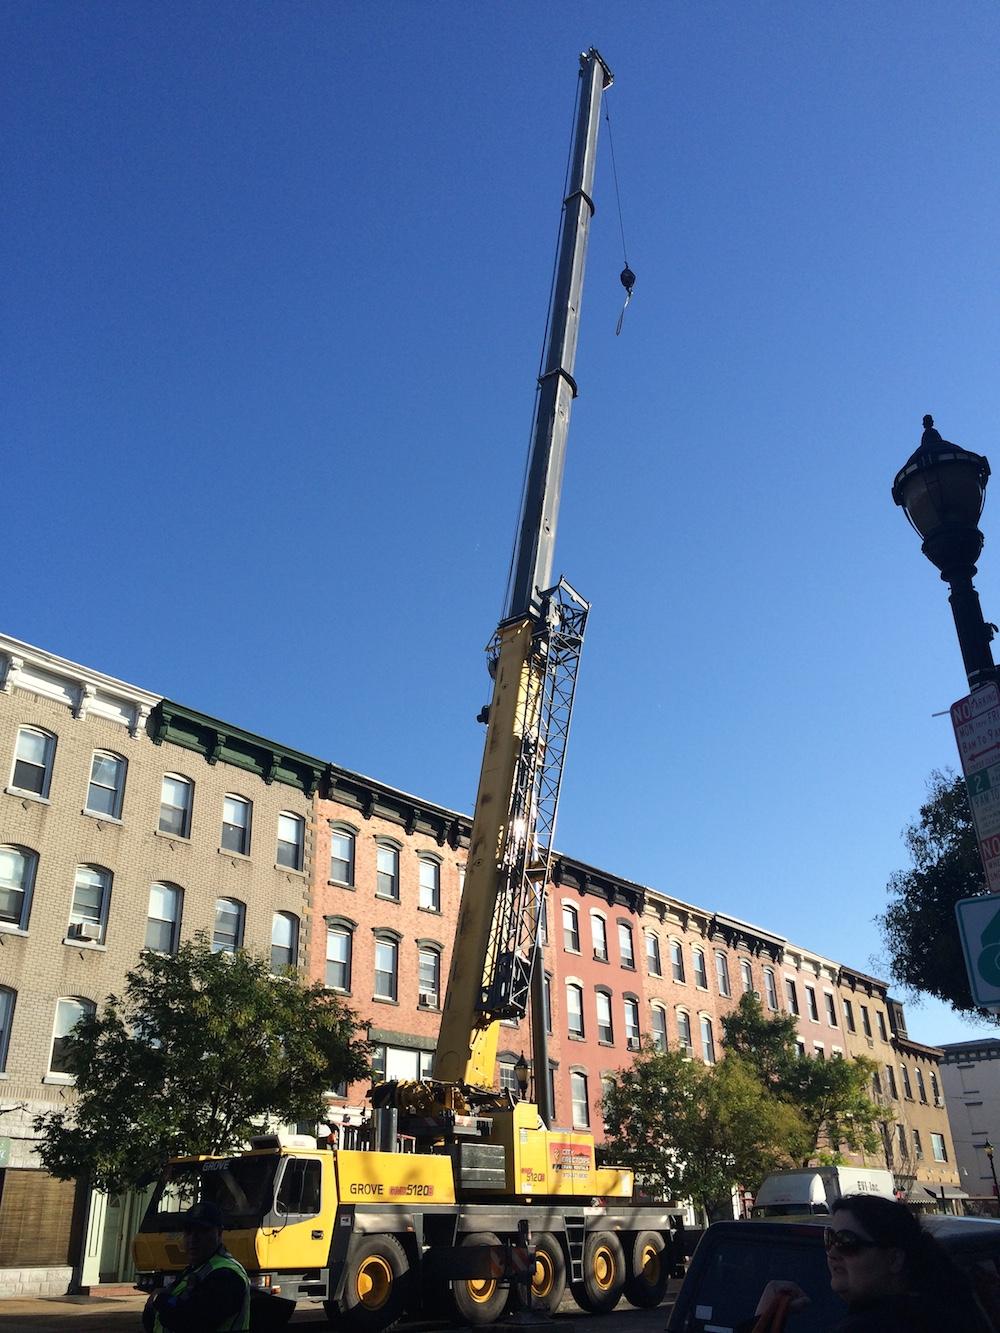 Installing Flatbread Grill Hoboken NJ Hood System